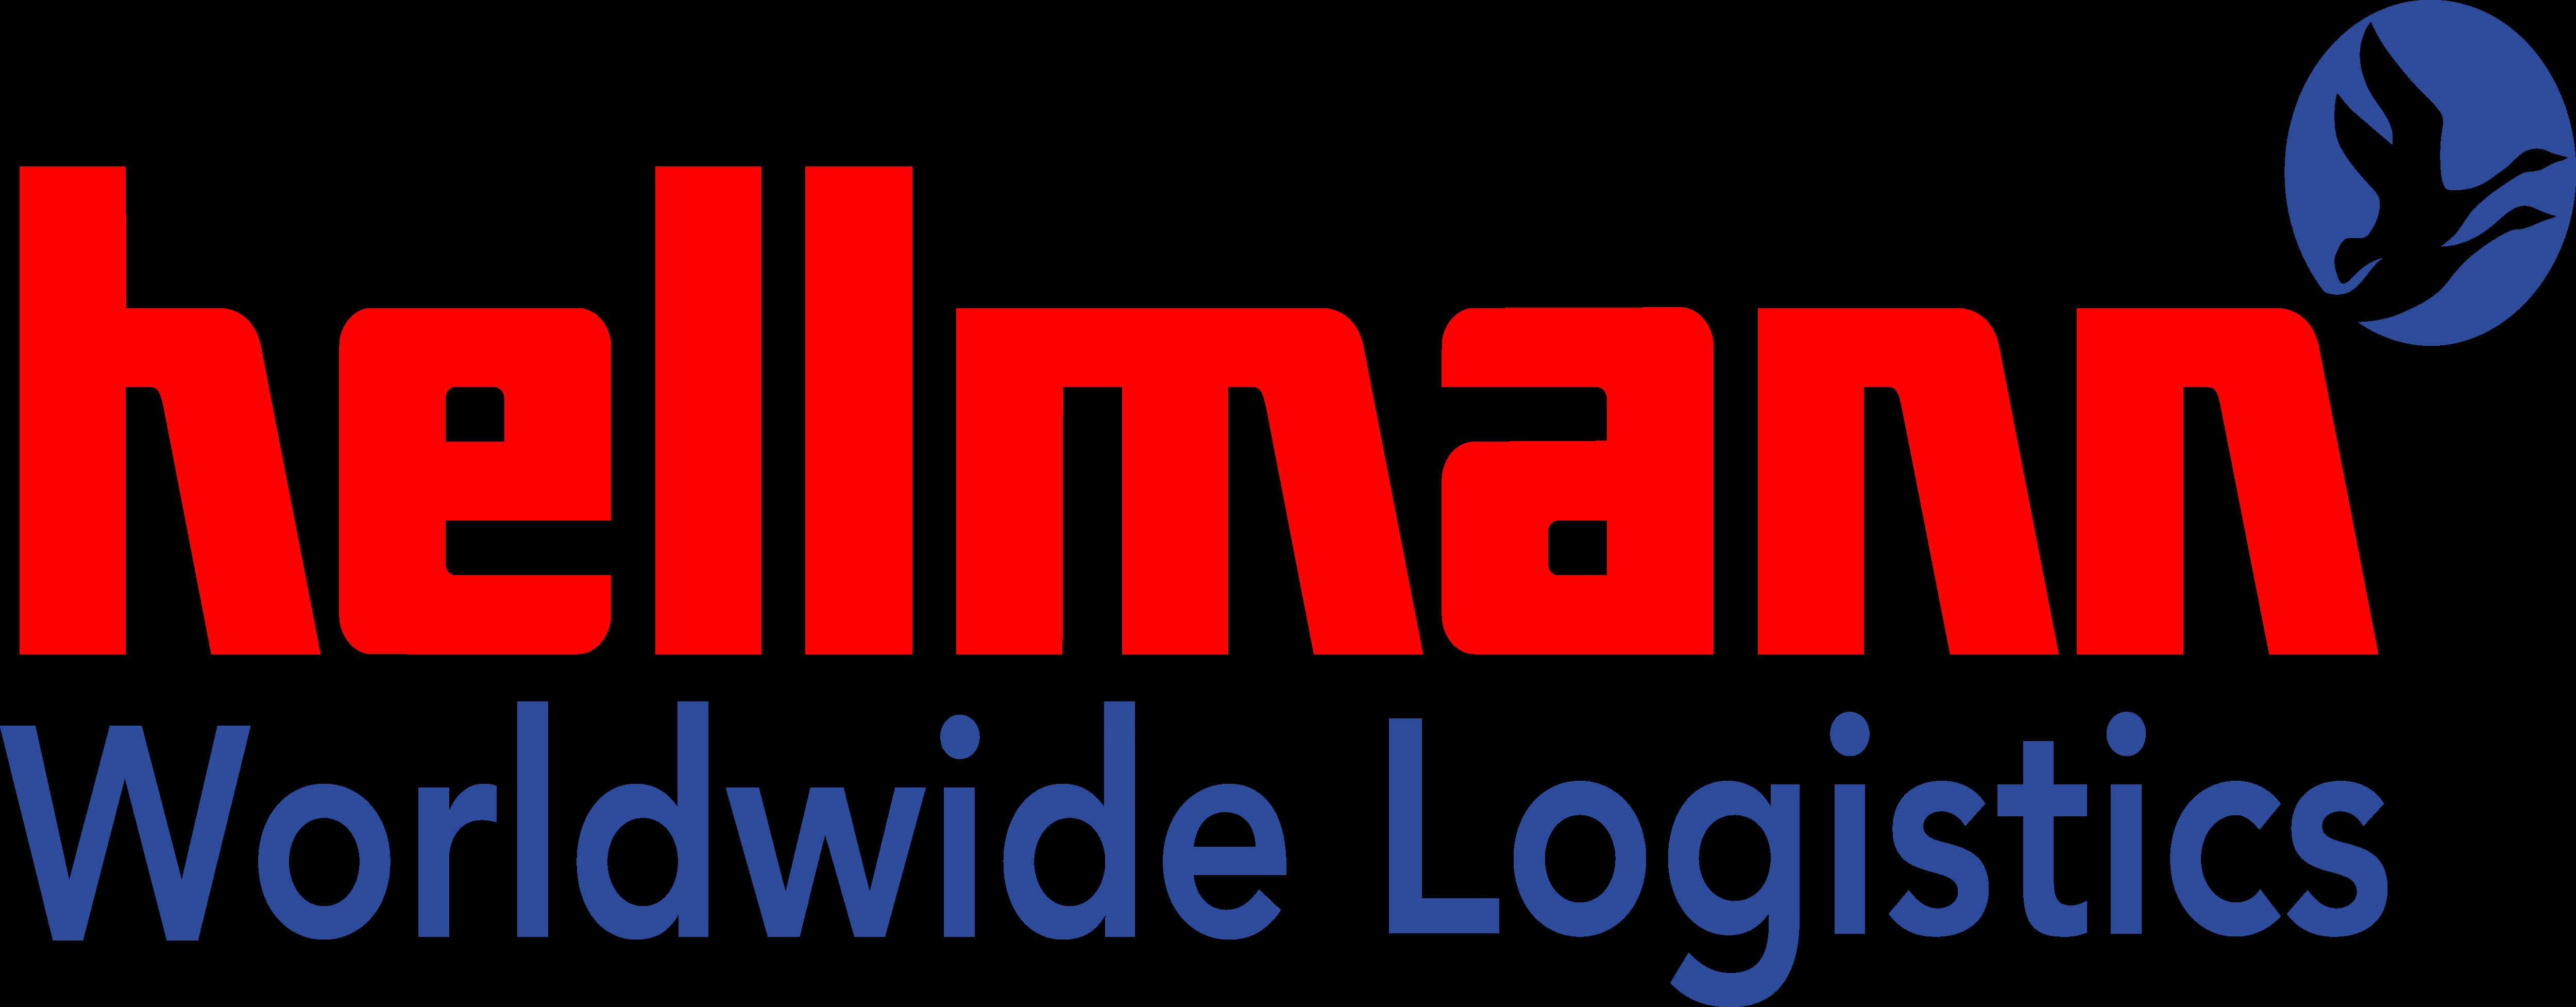 Hellmann Worldwide Logistics Logo full